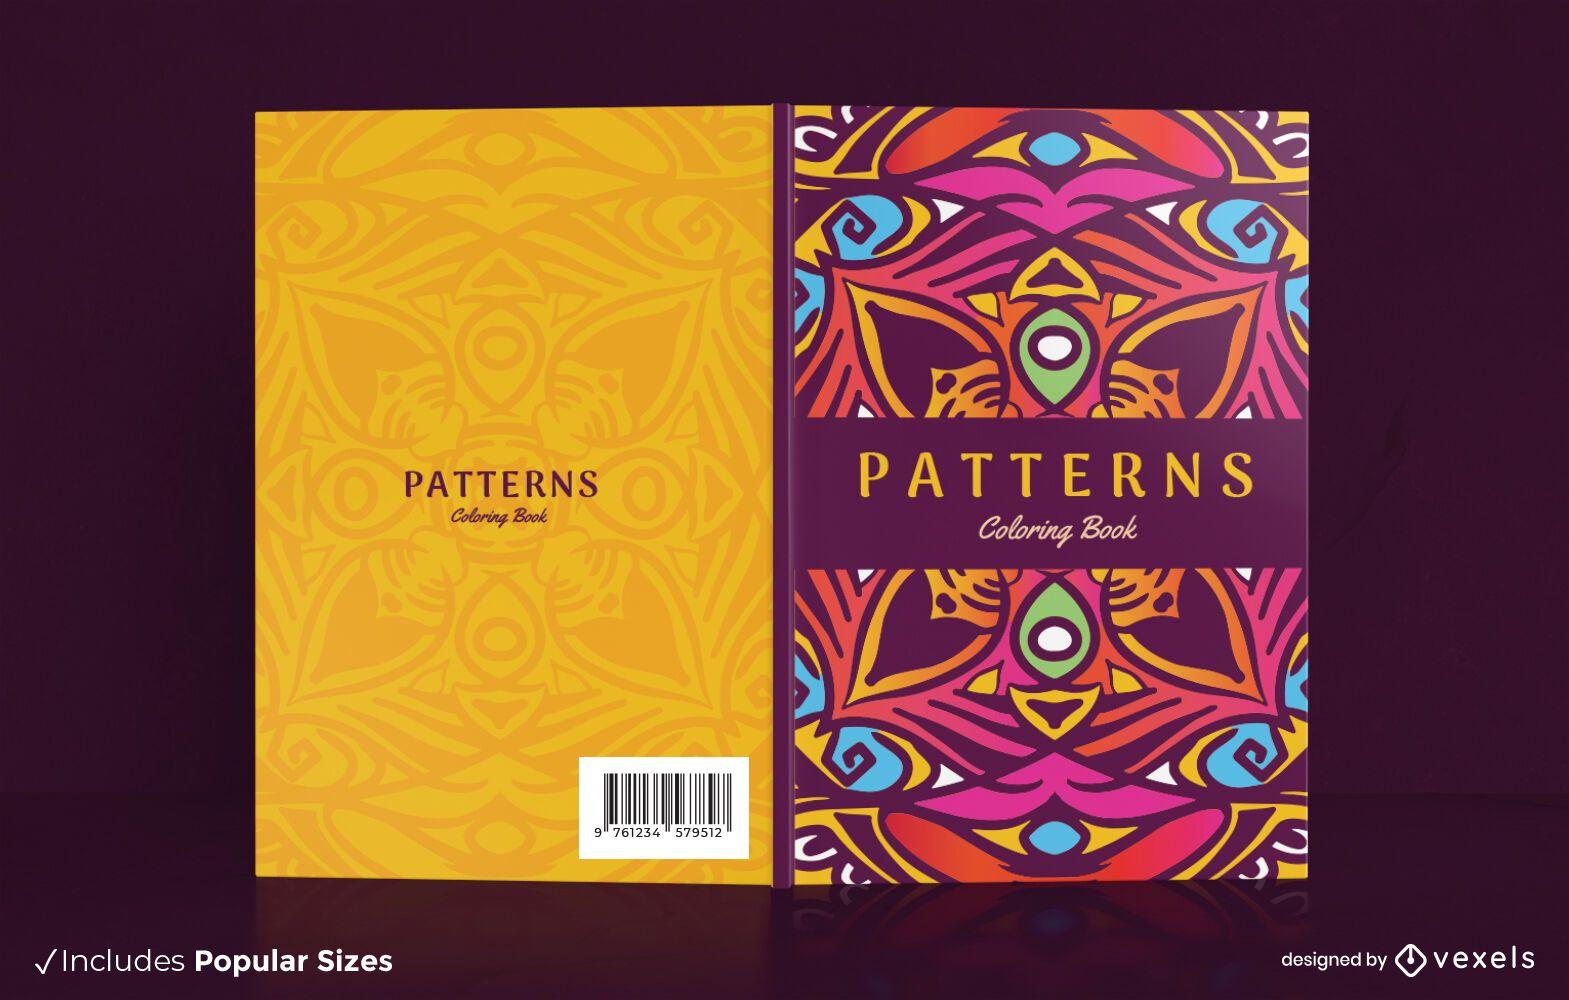 Diseño de portada de libro para colorear con patrón de mandala